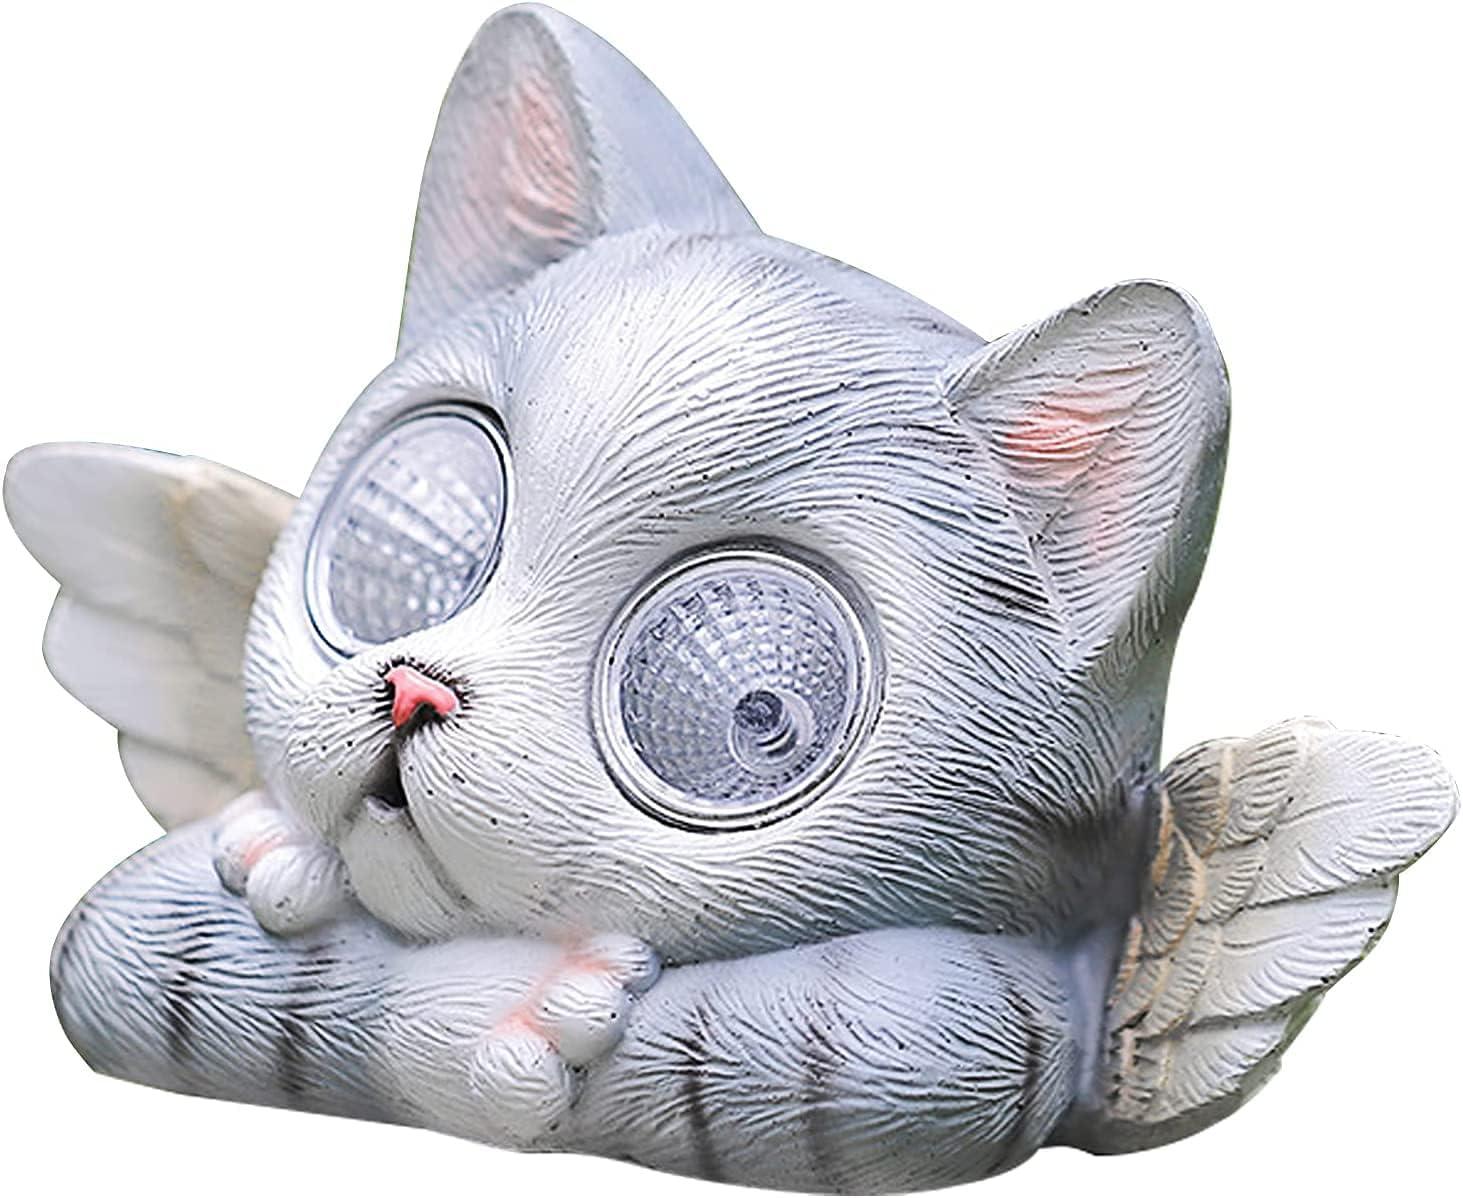 Chanety Solar Indefinitely Light Wholesale Cat Decoration in Animal Garden Statue